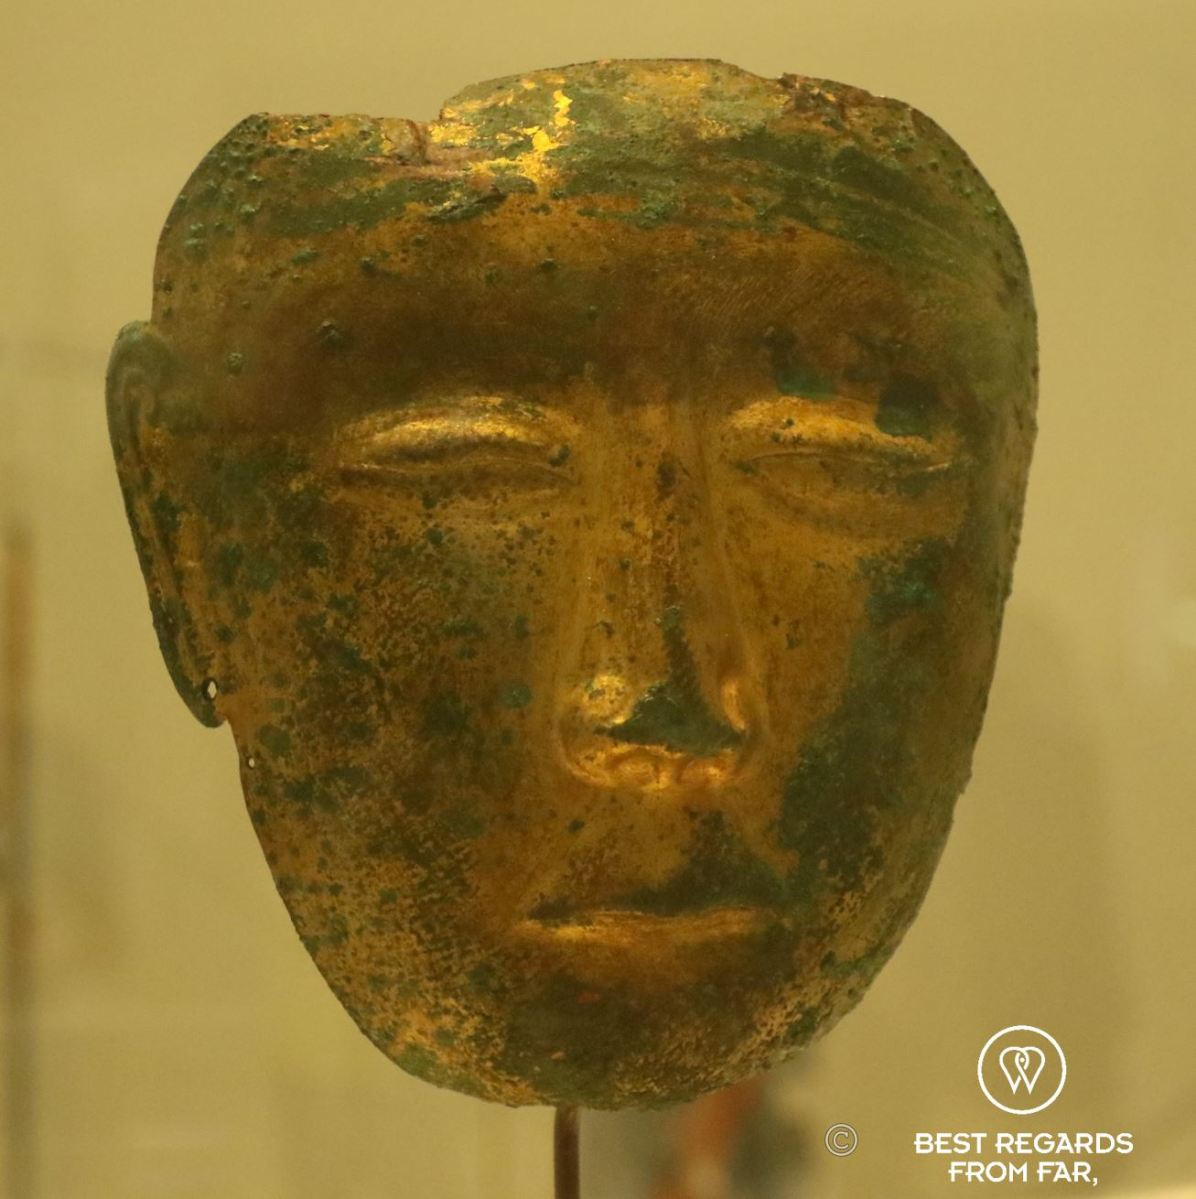 Gilded funerary mask, Northern China, 907-1125, Louvre Abu Dhabi, UAE.